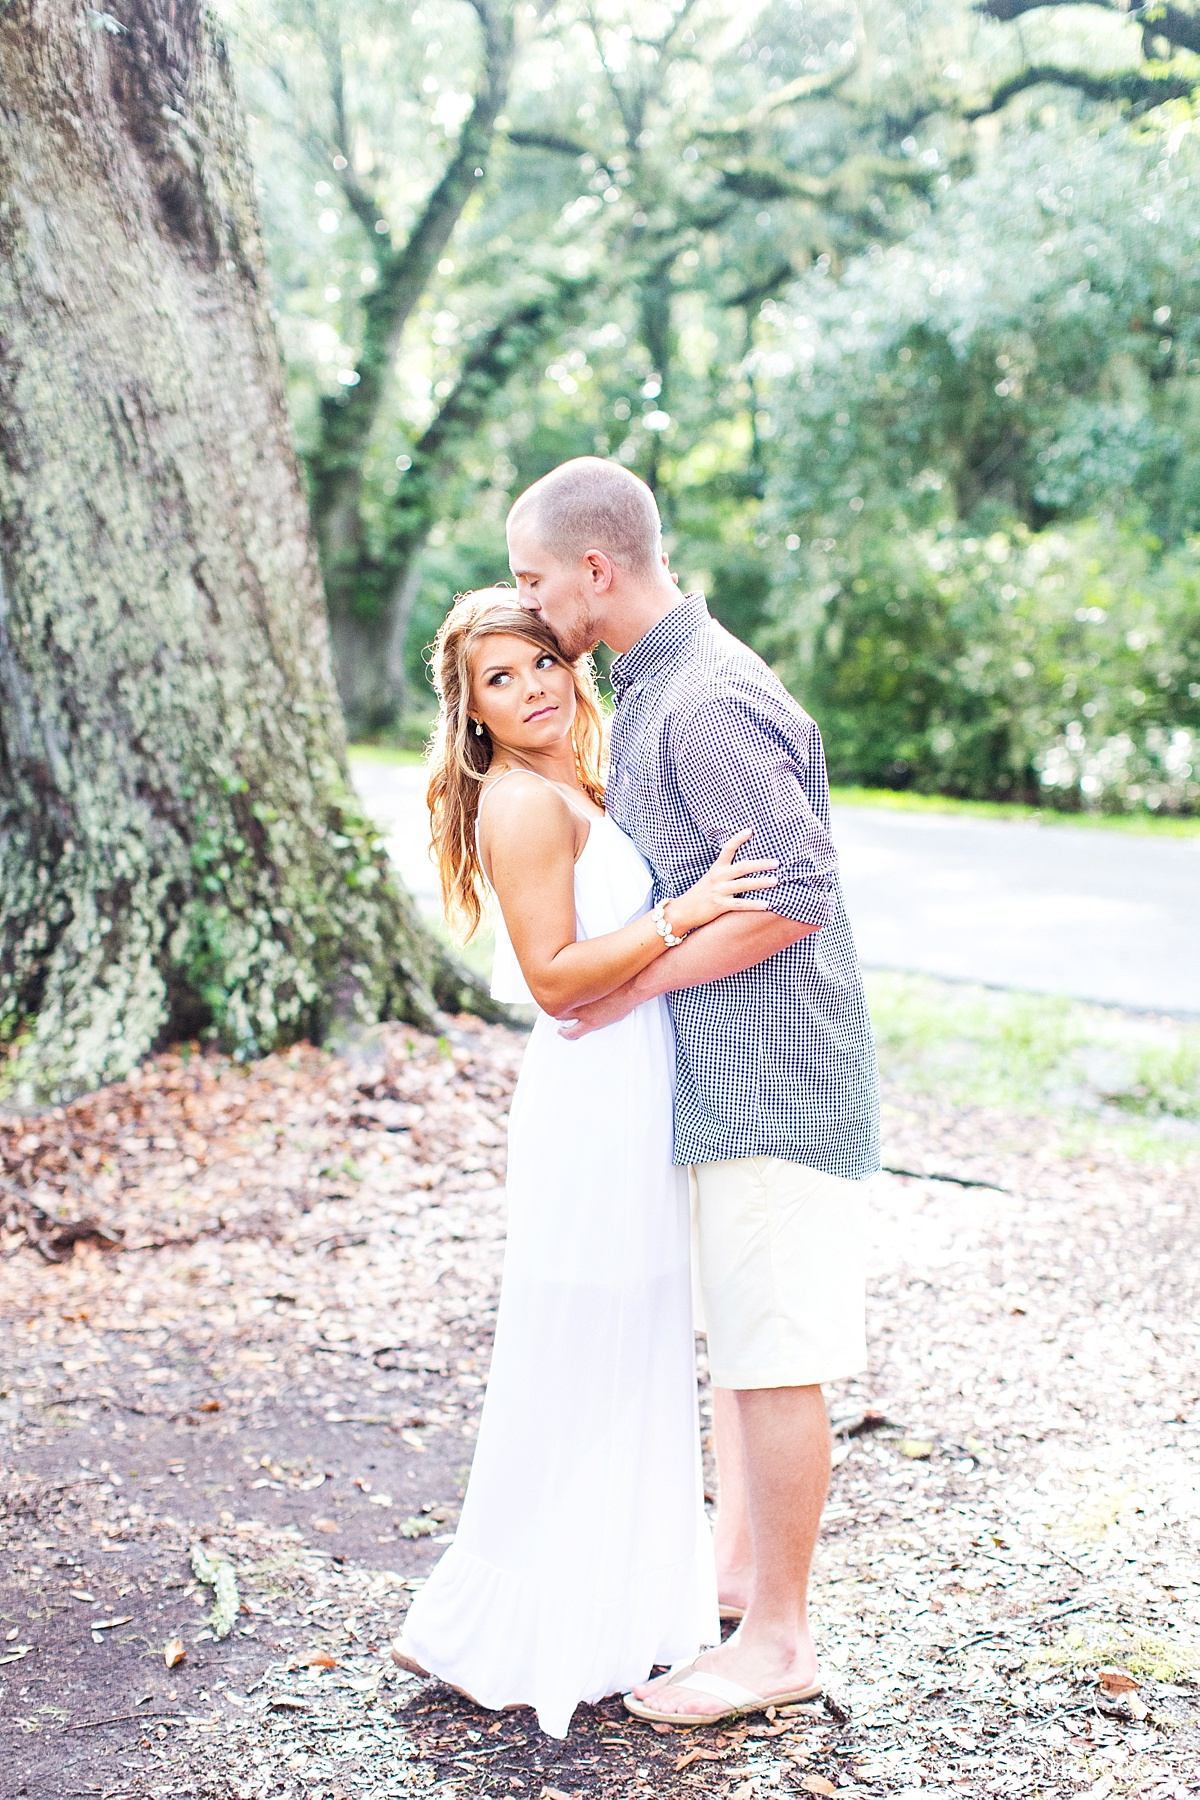 Wedding Photography Charleston Sc: Charleston, SC Wedding Photographer